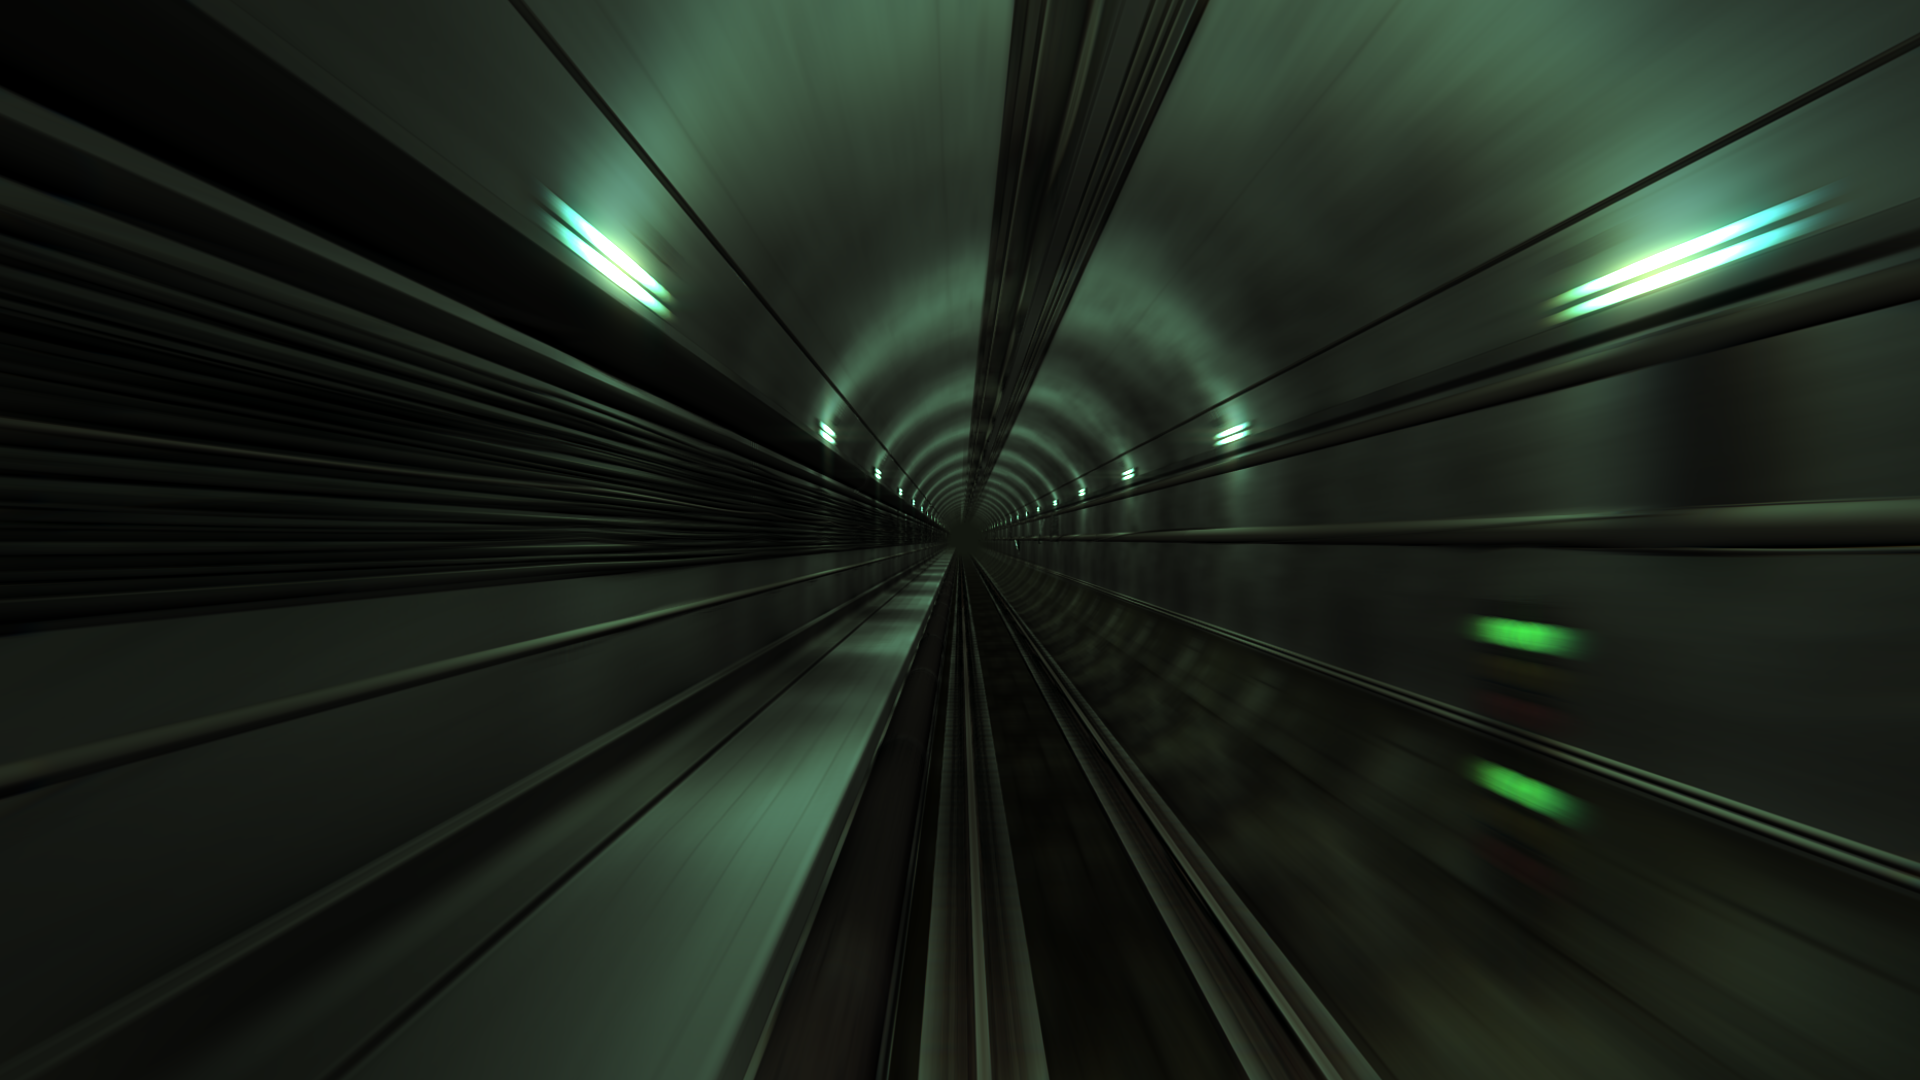 Tunnel Wallpaper 45967